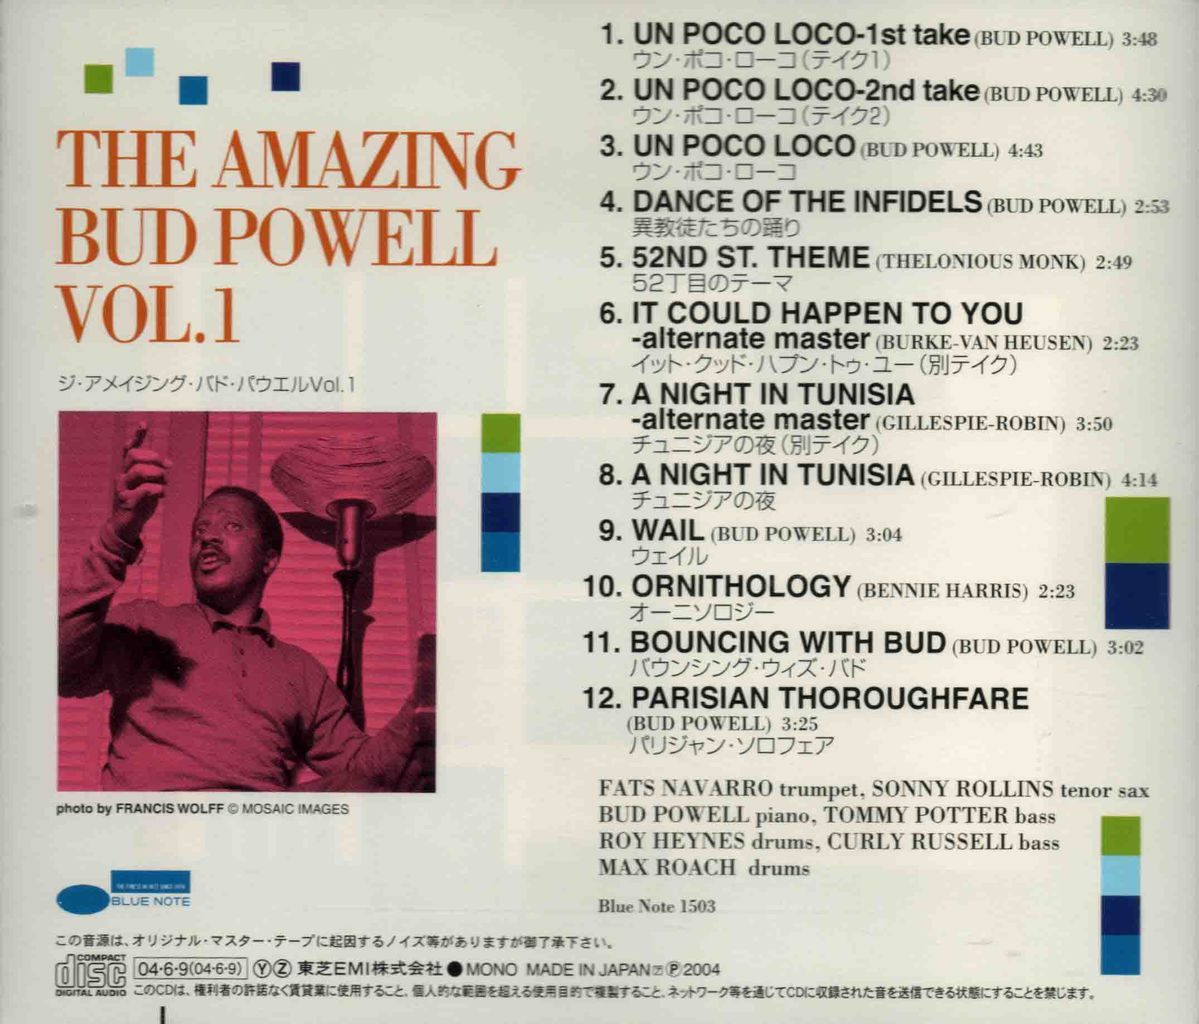 THE AMAZING BUD POWELL VOL.1-2